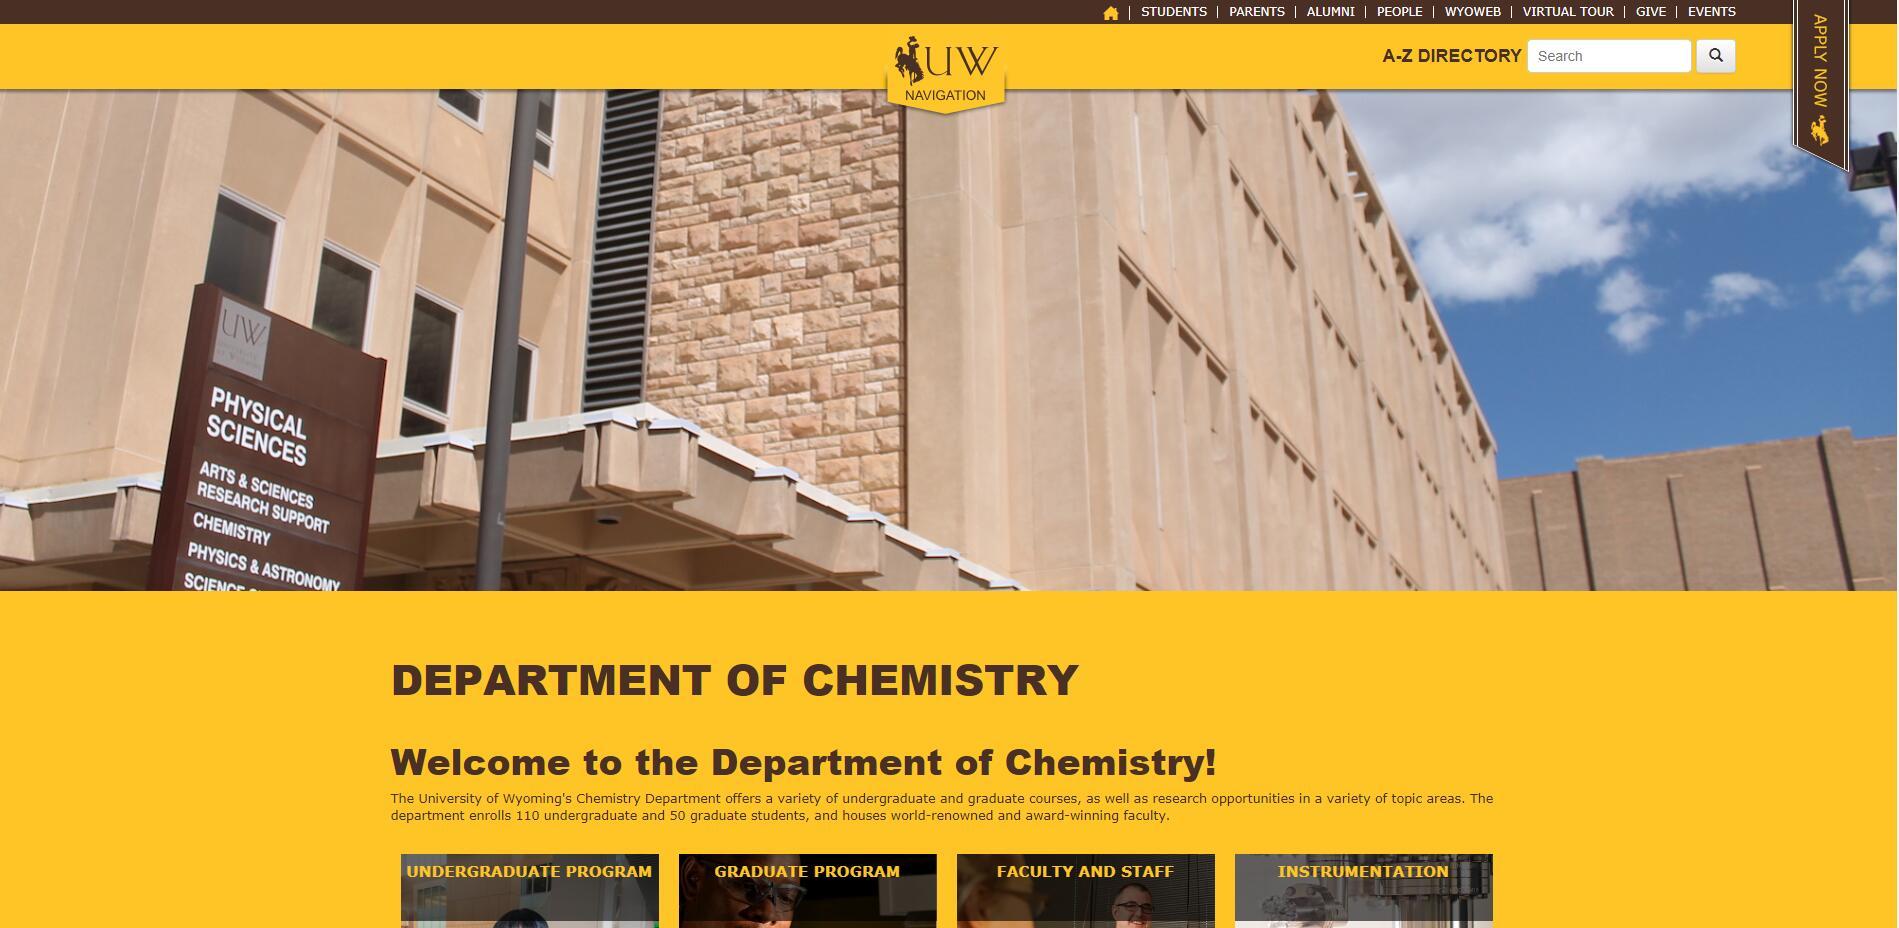 Top Chemistry Schools in Wyoming